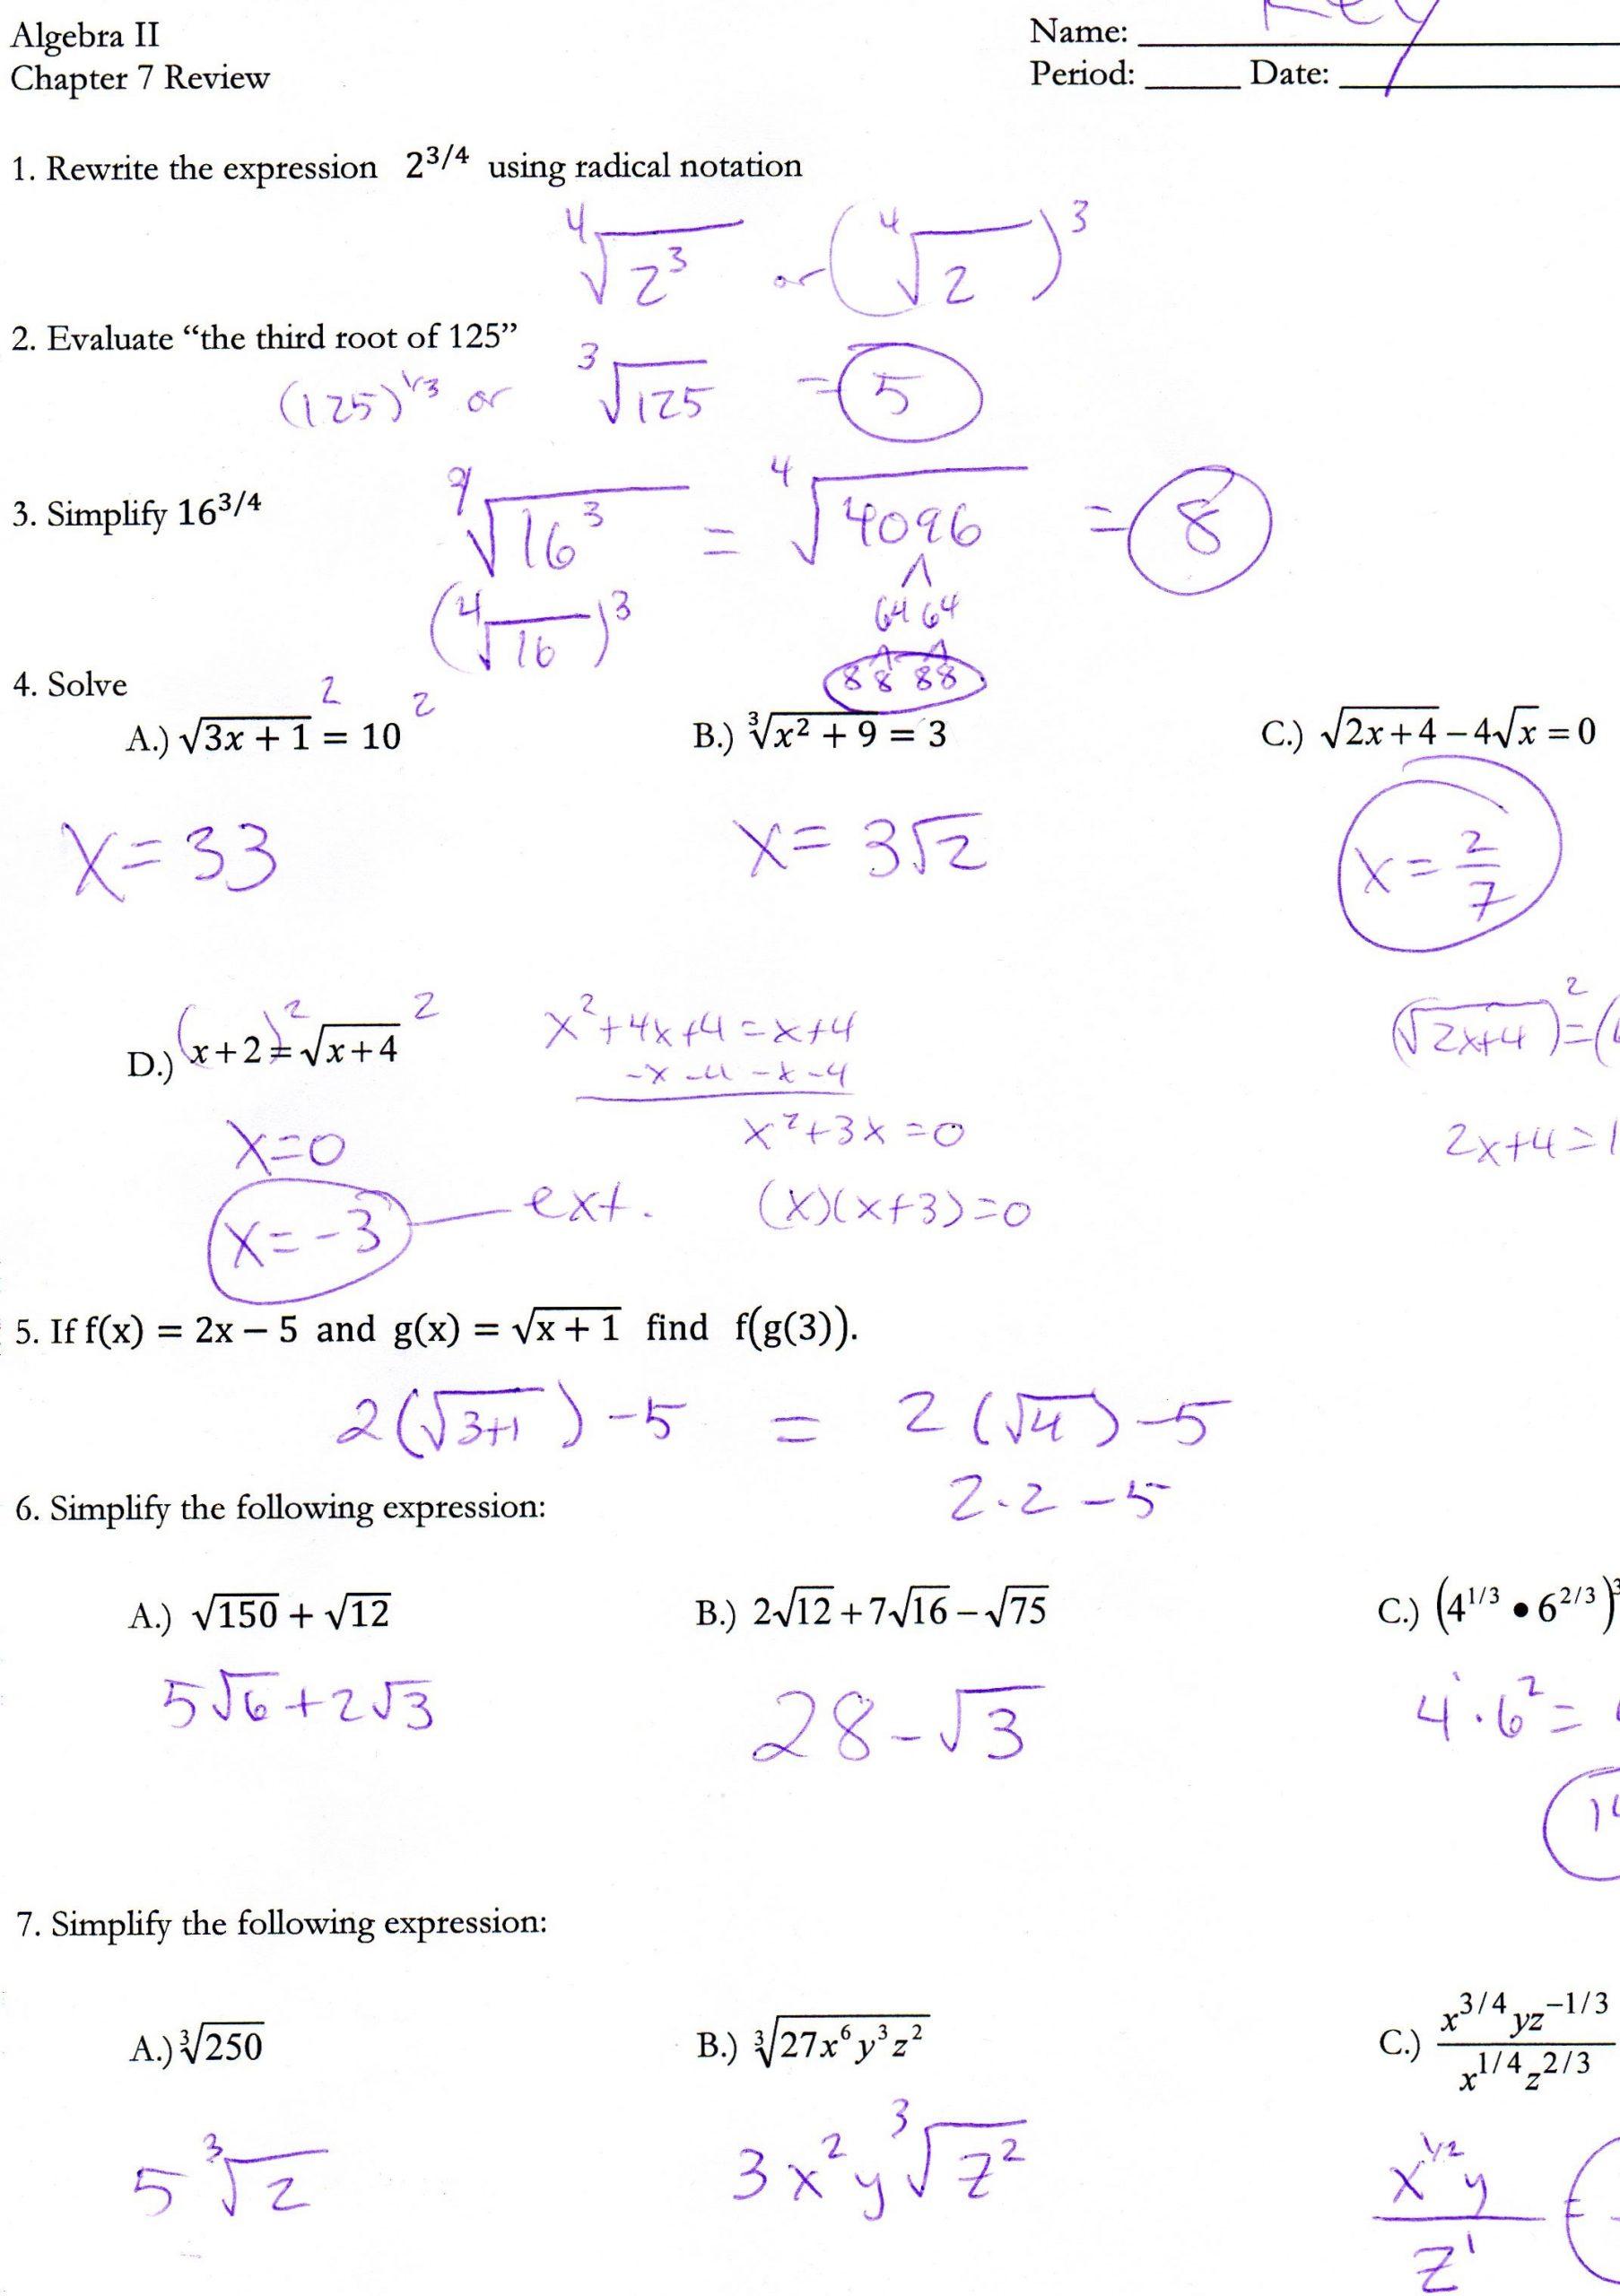 Solving Square Root Equations Worksheet Algebra Ii Mr Shepherd S Pasture